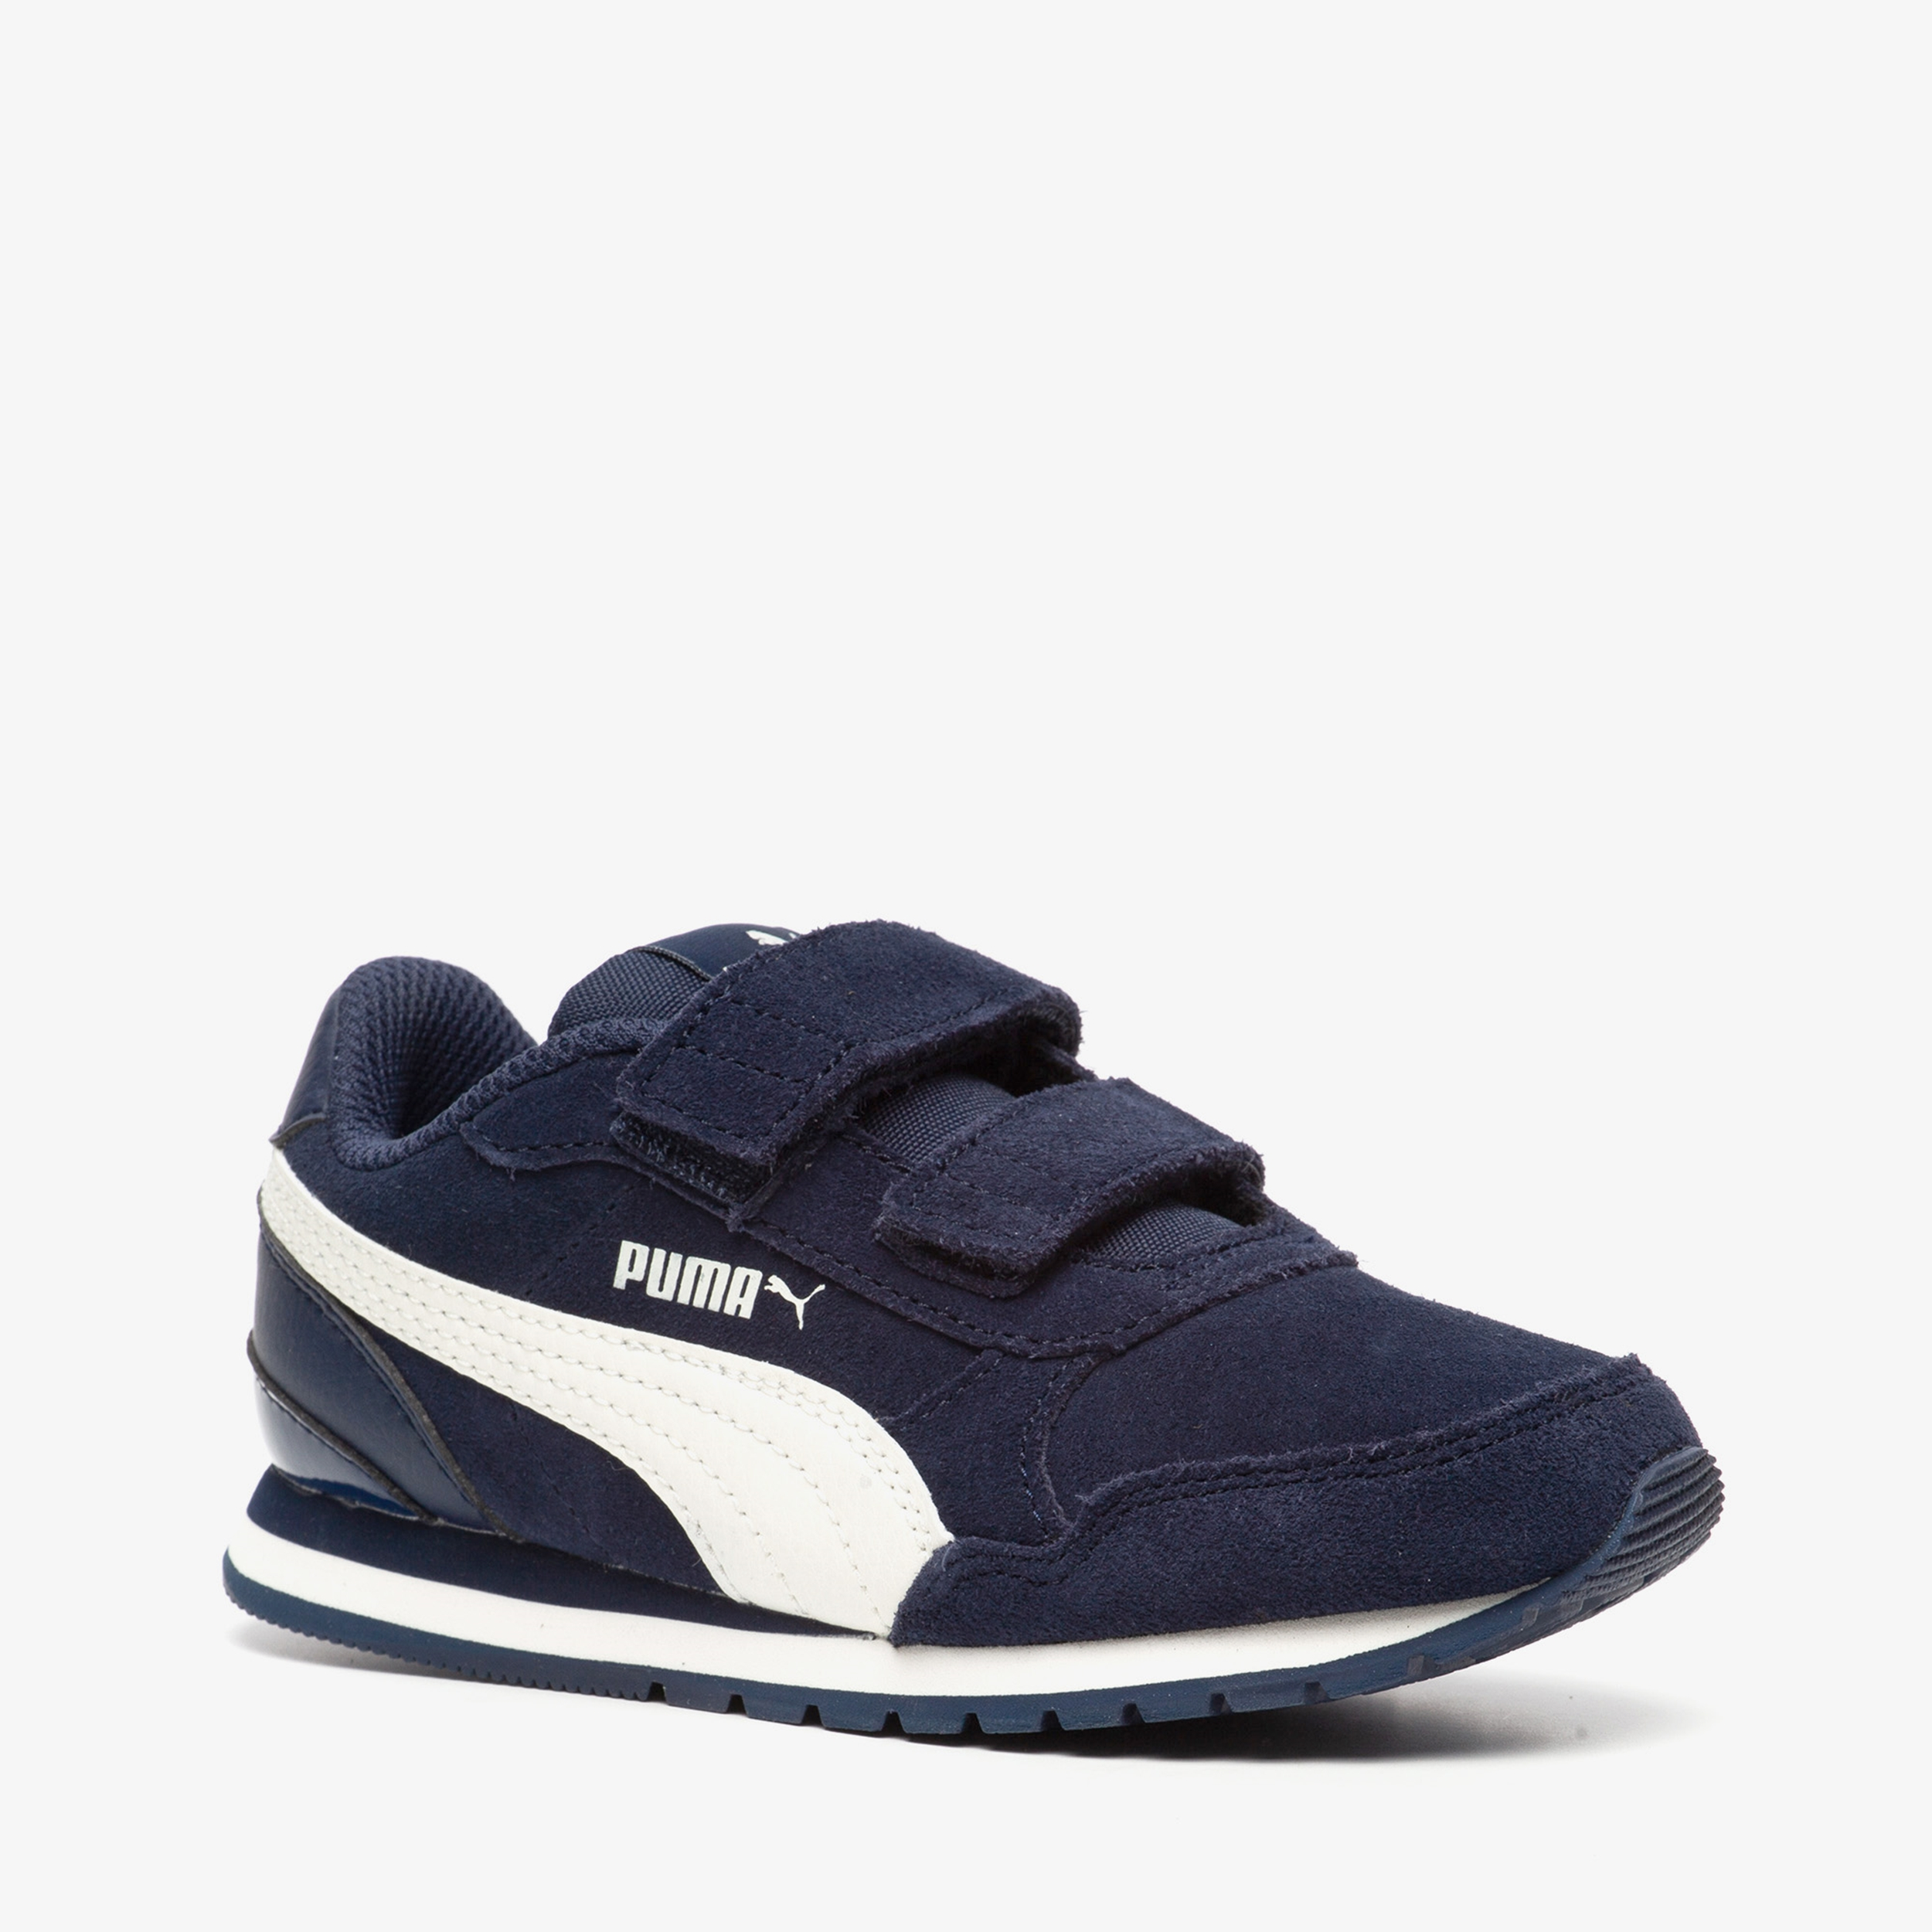 Puma ST Runner jongens sneakers | Scapino.nl